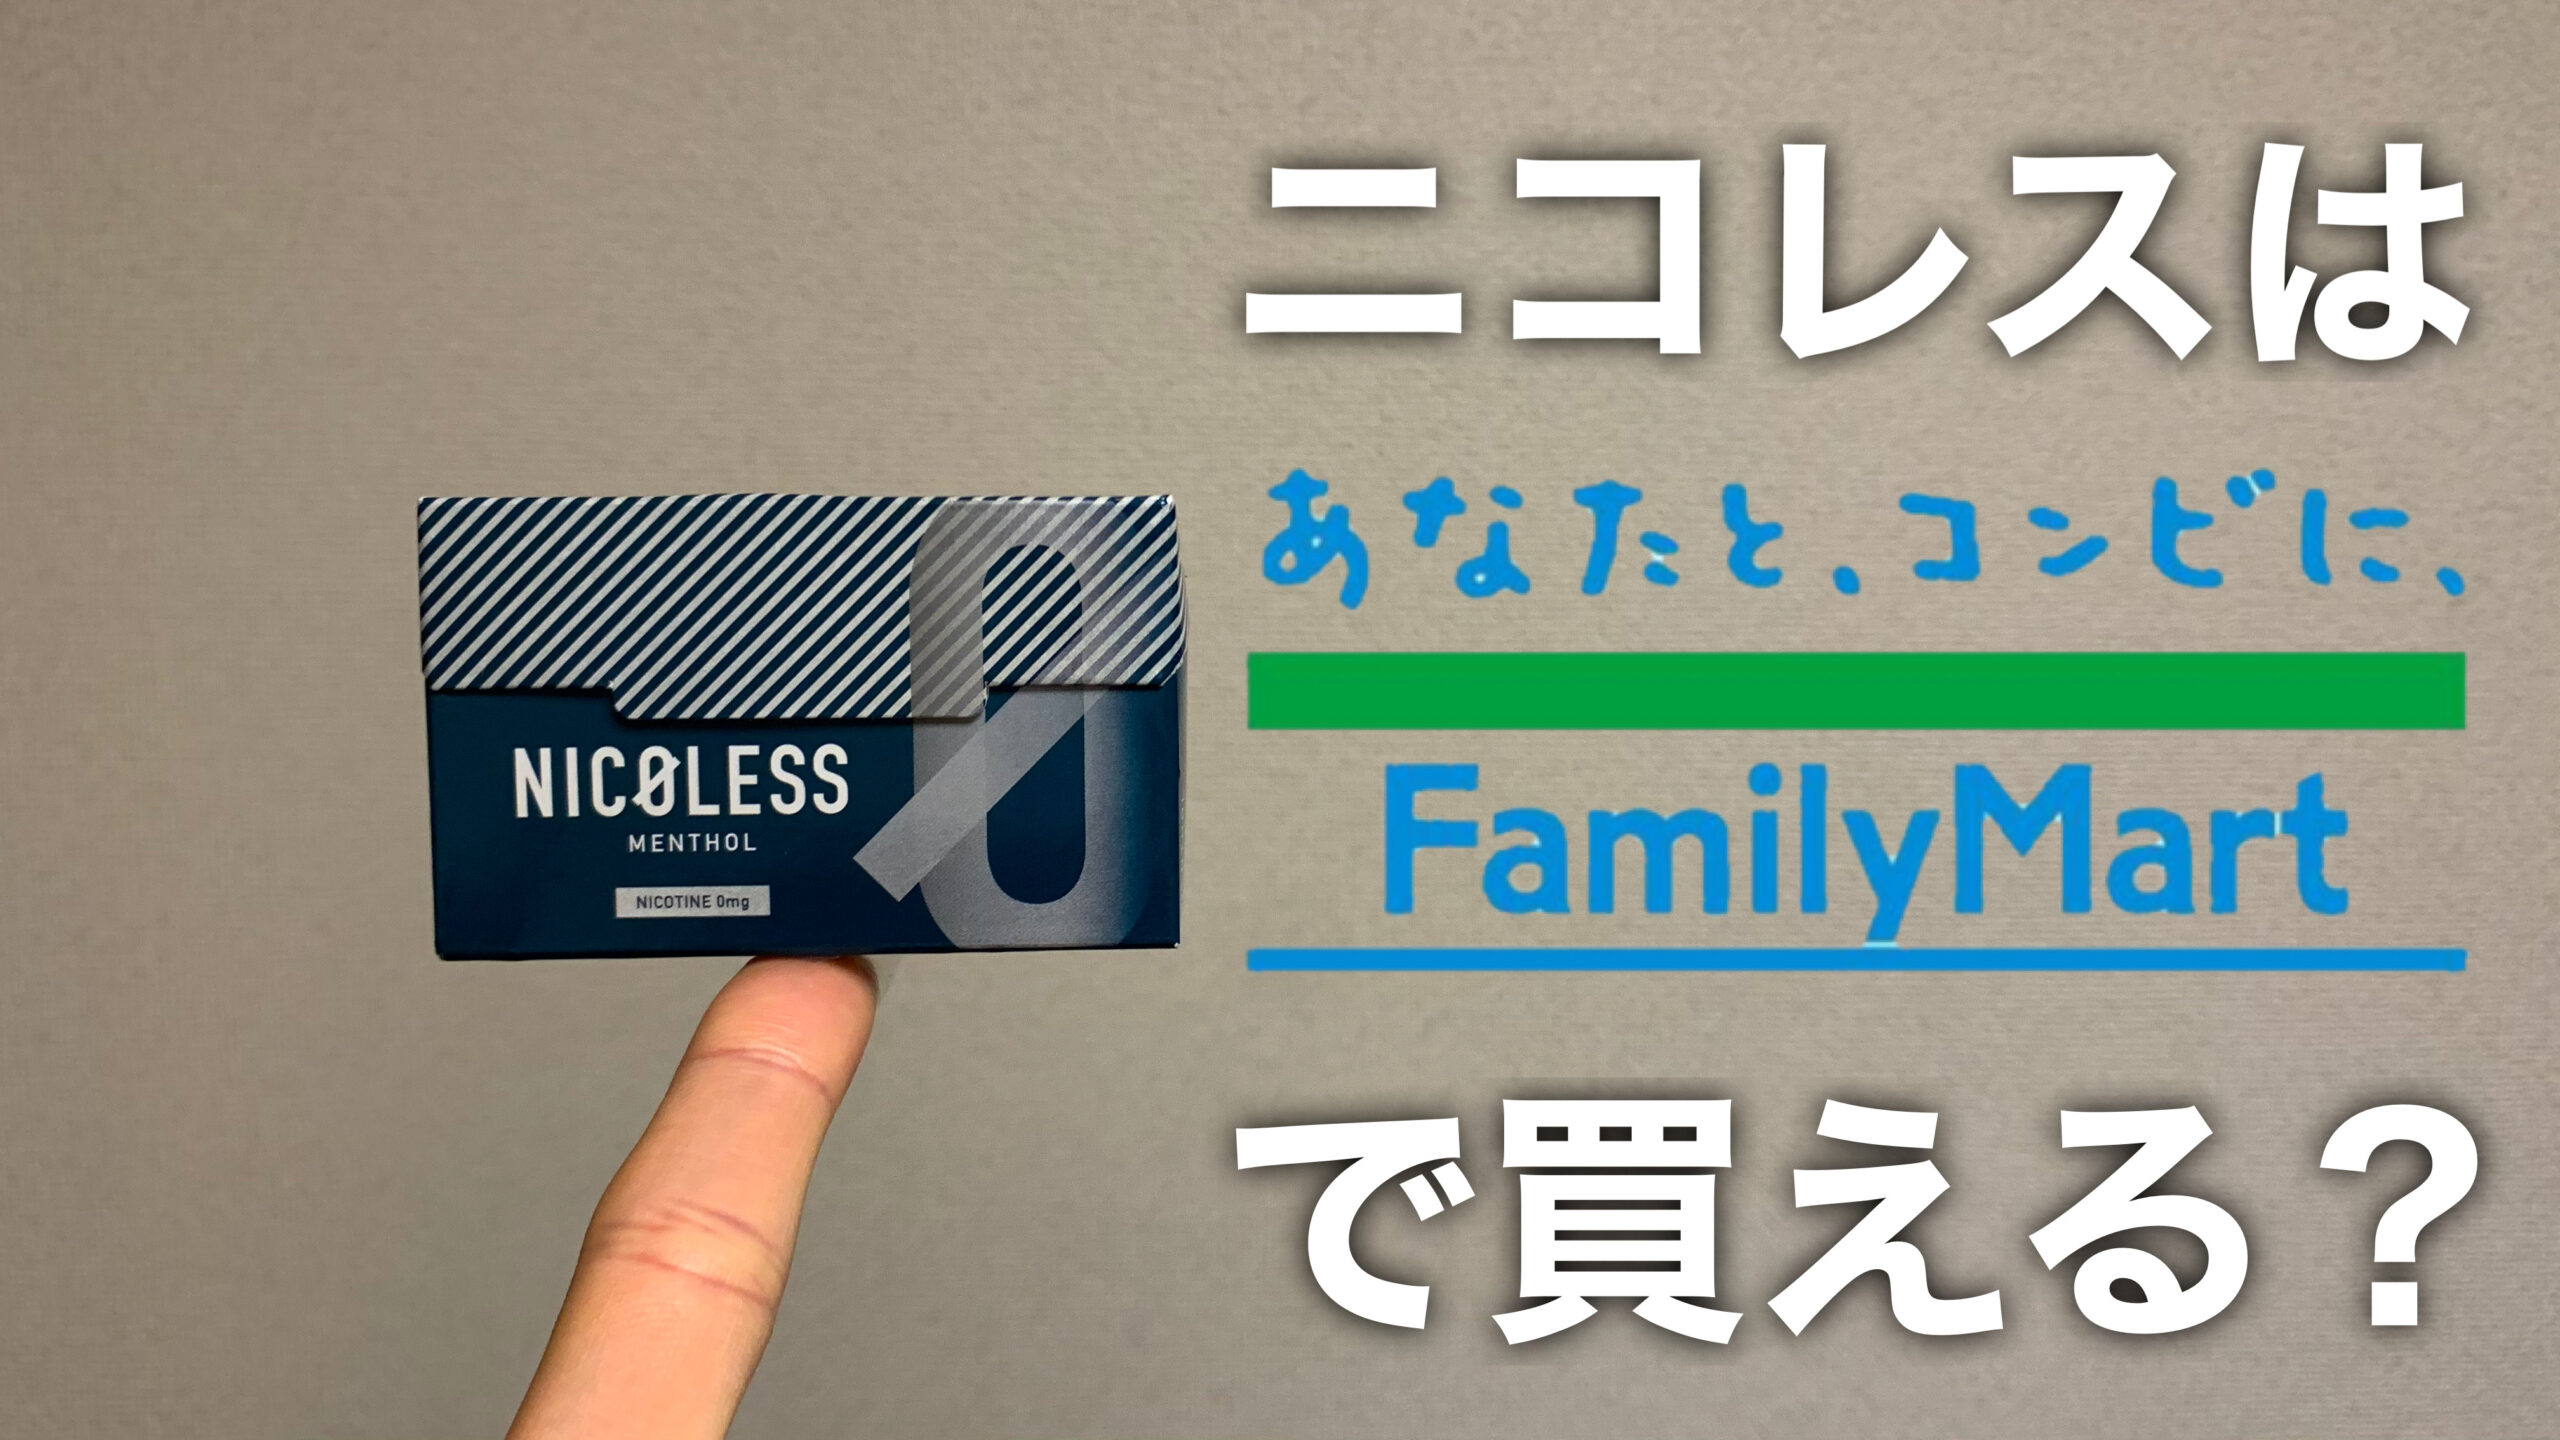 nicoless-familymart eyecatch